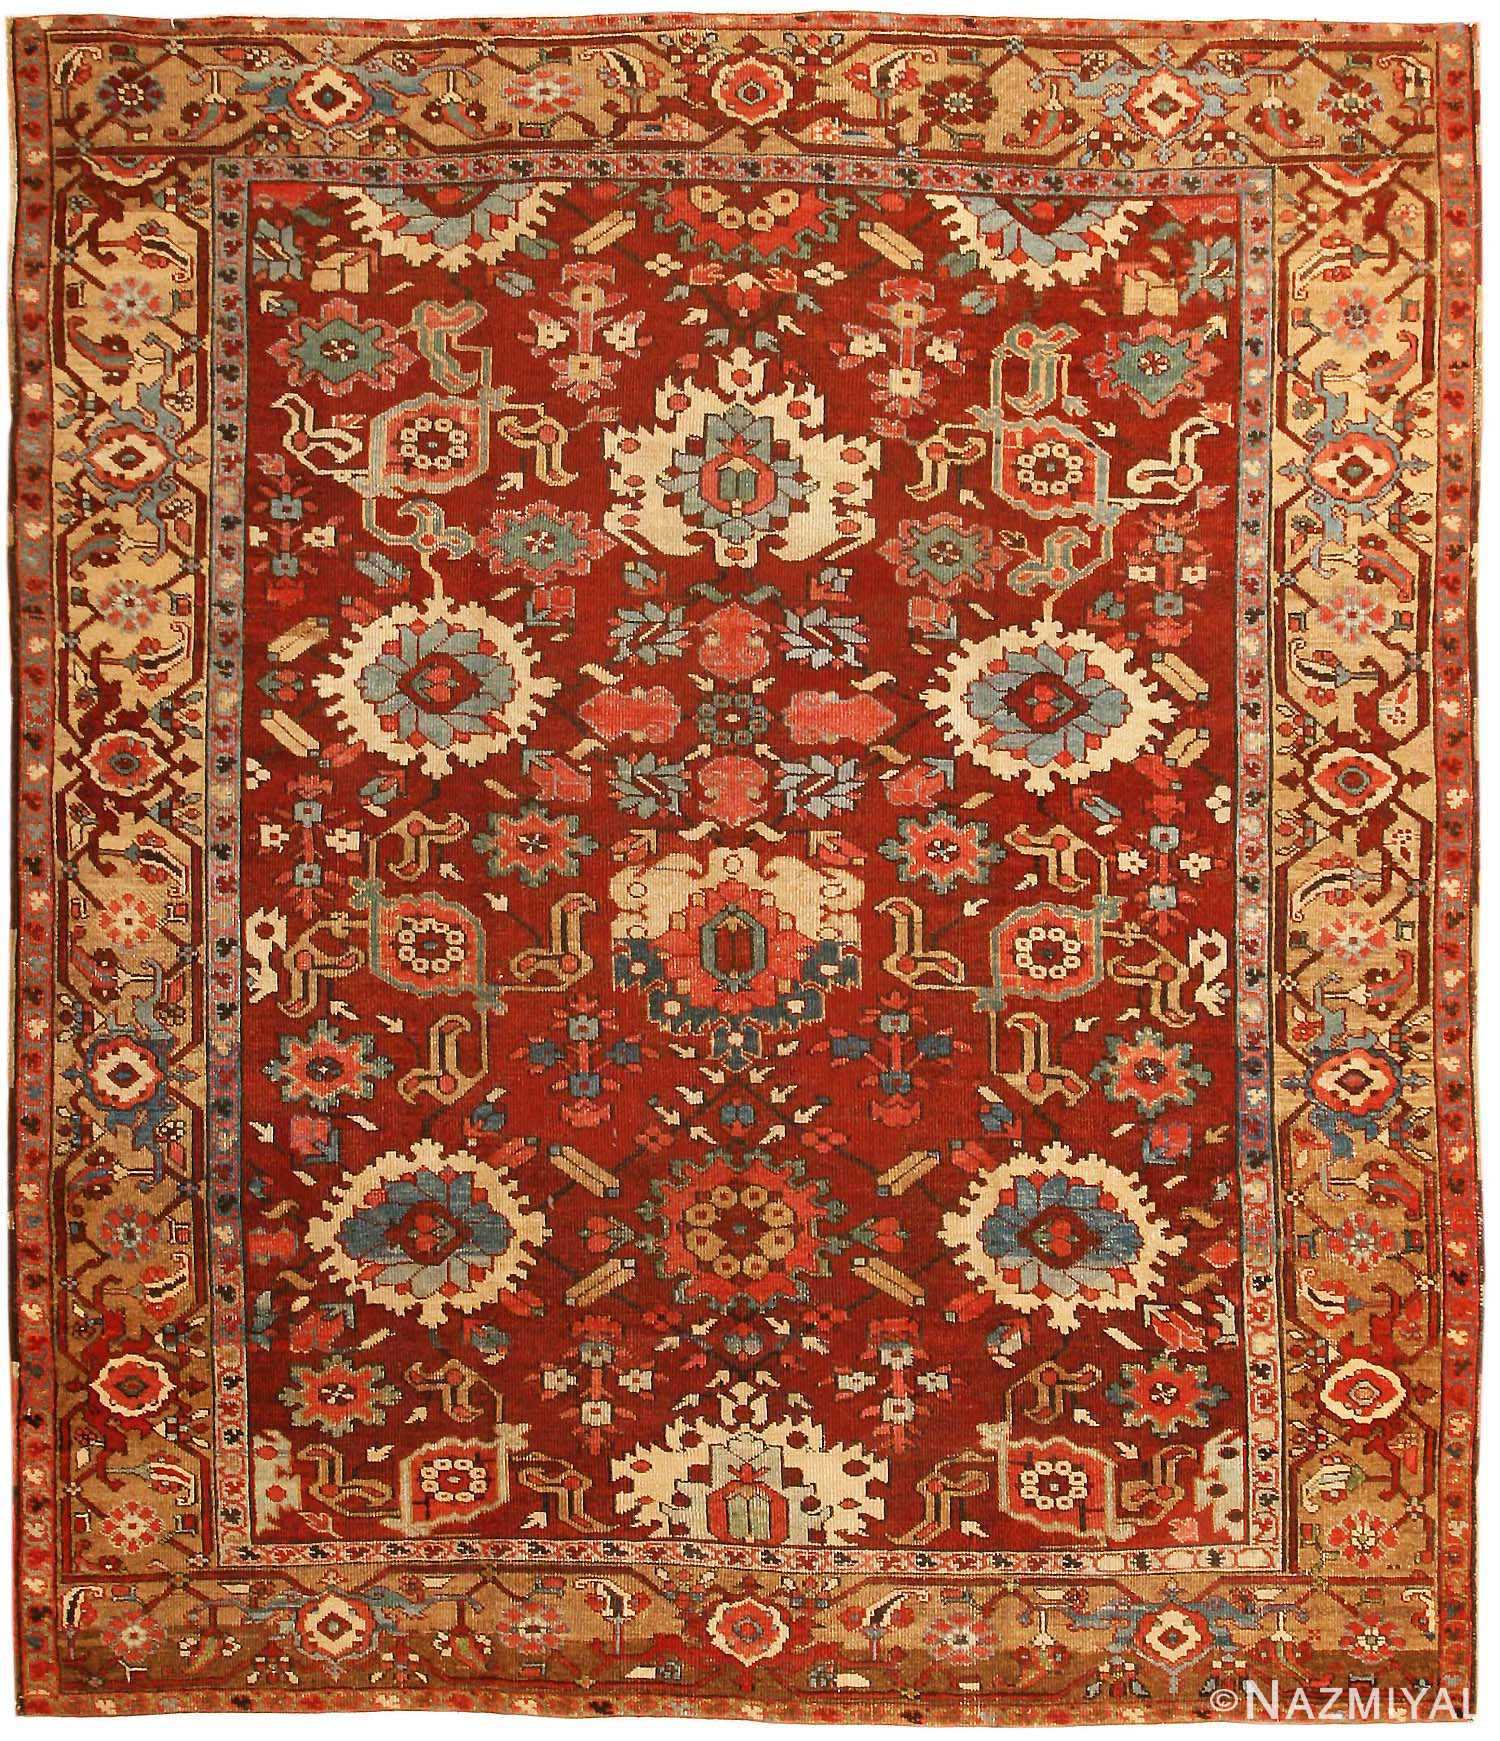 Vintage Persian Rugs: Antique Serapi Rug 43451 By Nazmiyal